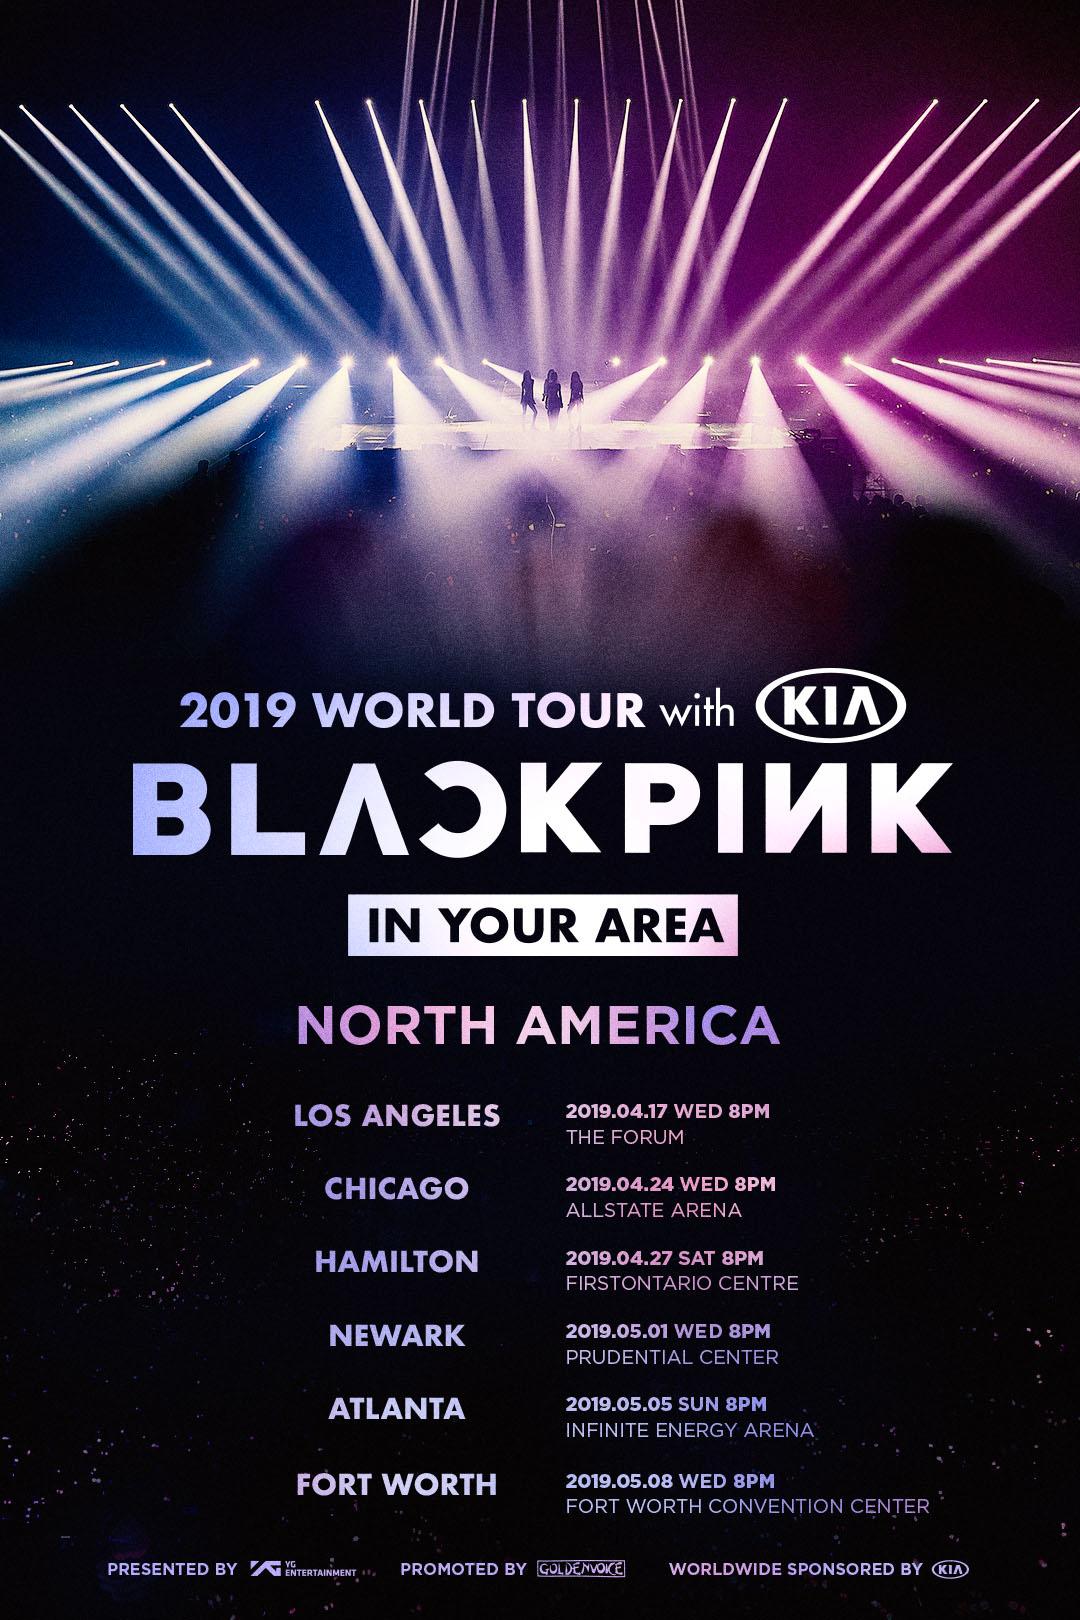 BLACKPINK_2019worldtour_POSTER_N.AMERICA_ALL_poster